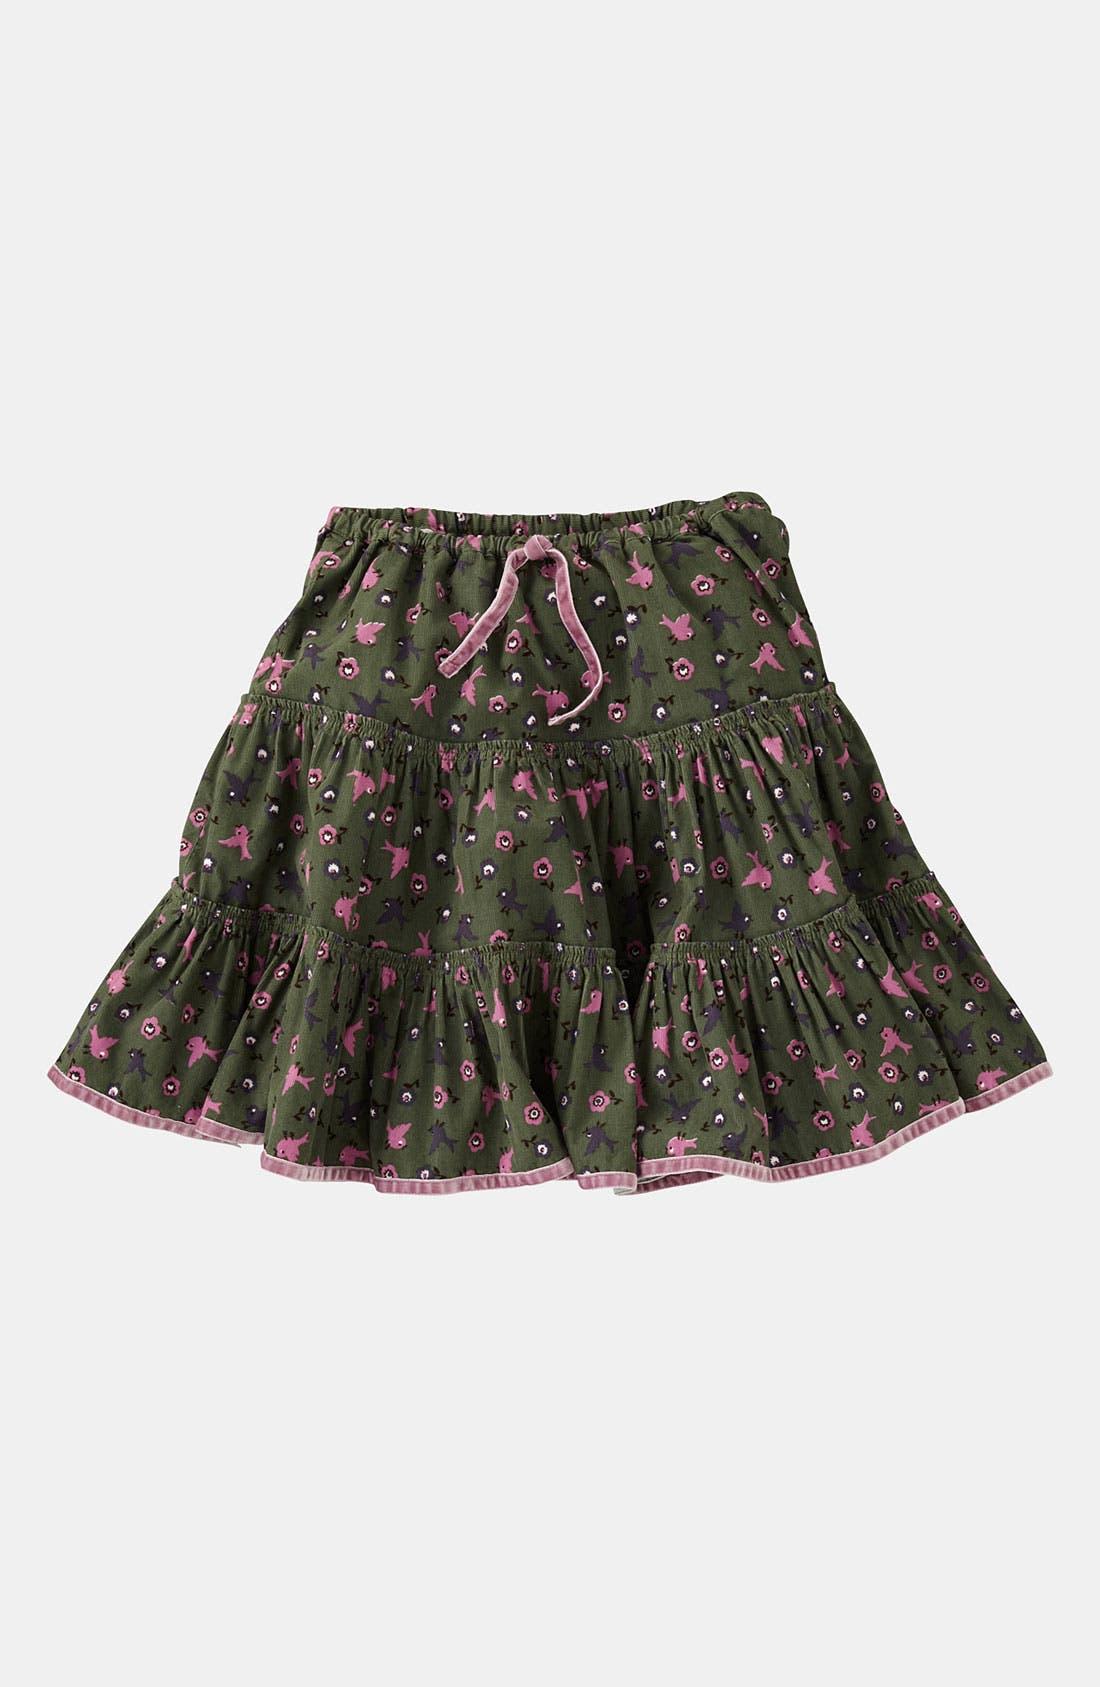 Main Image - Mini Boden 'Gypsy' Skirt (Toddler)